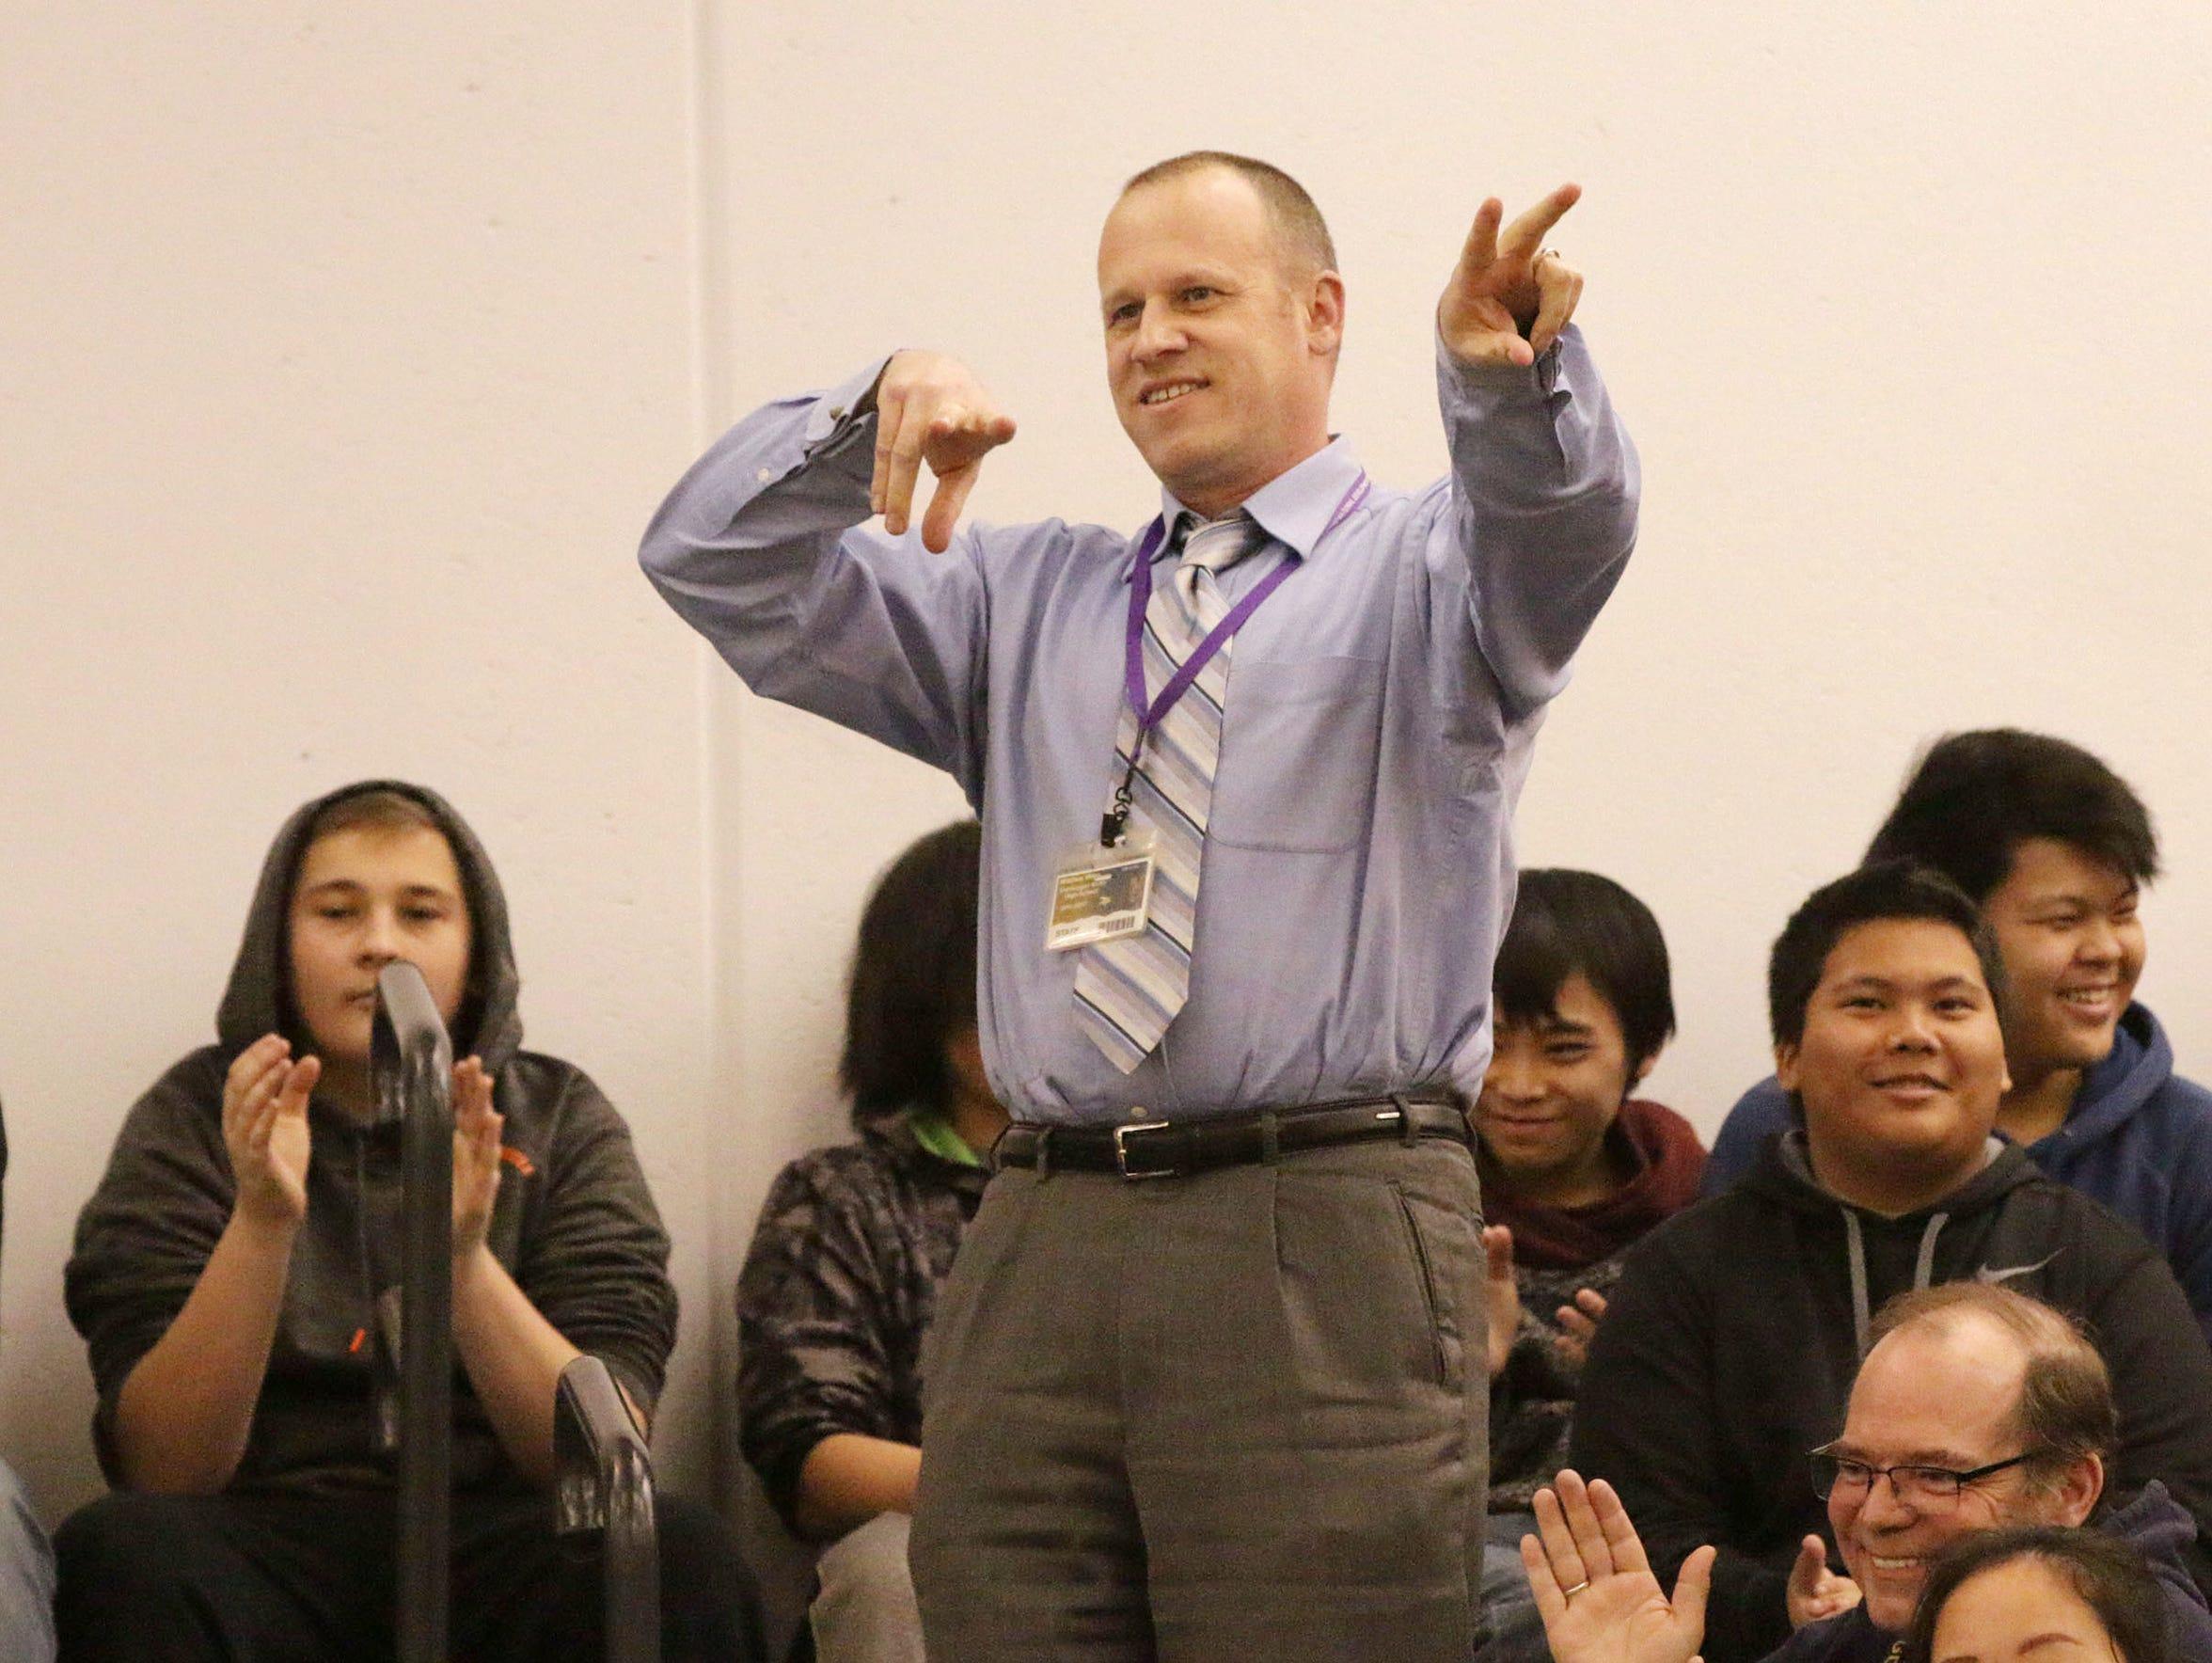 Sheboygan North English language learner teacher Matt